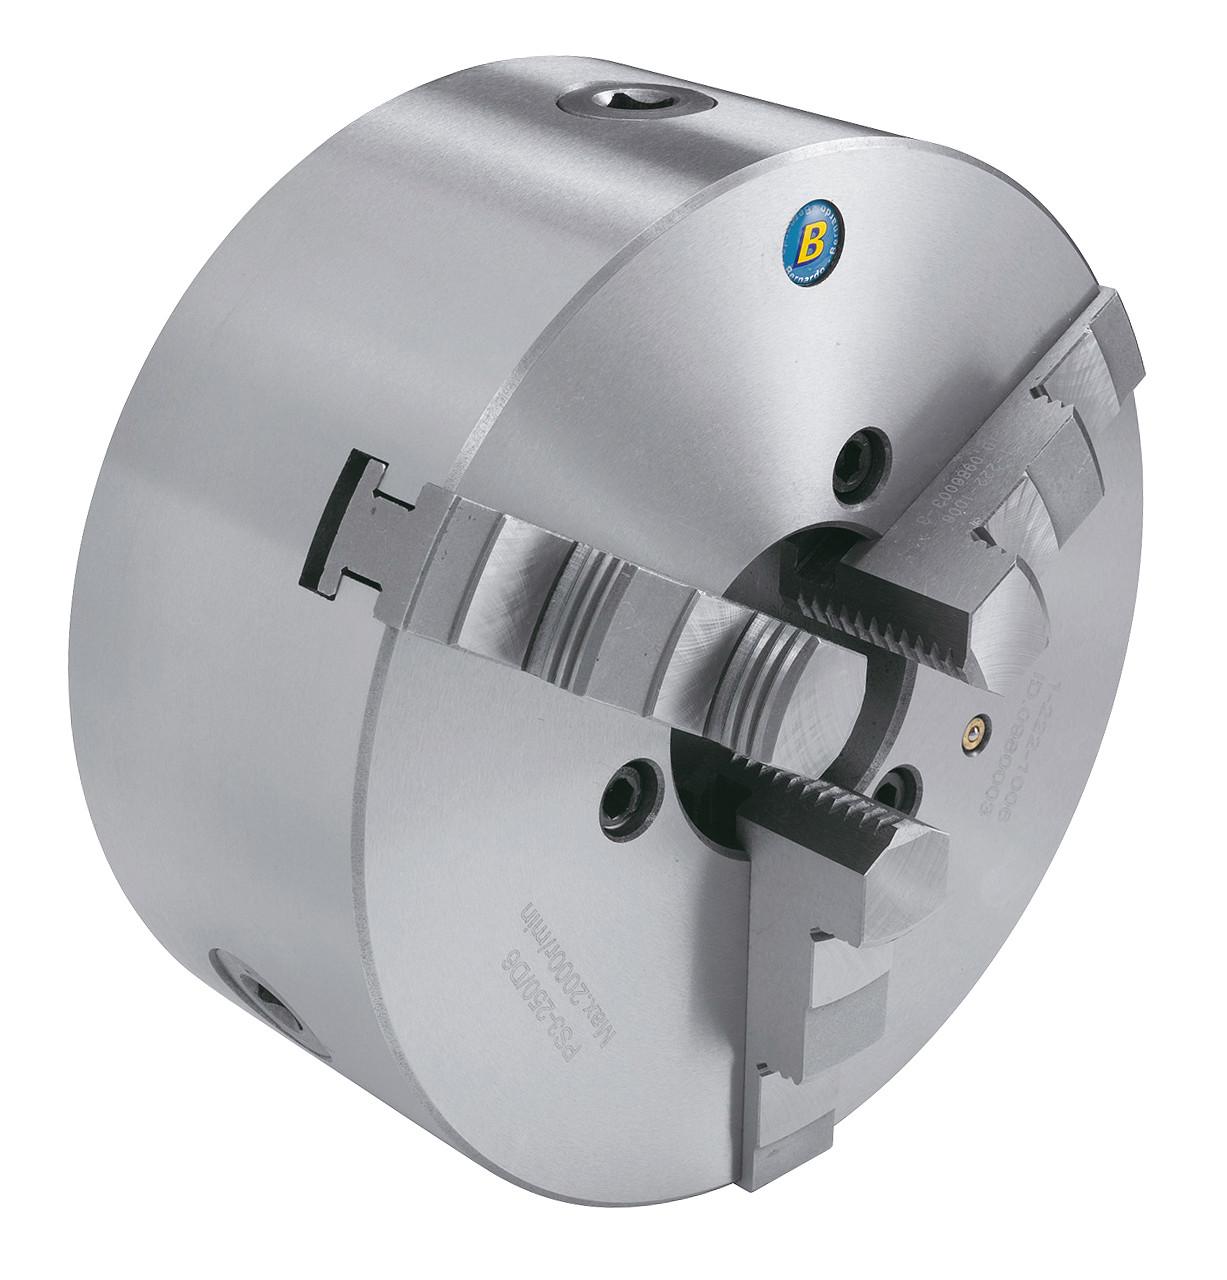 Стандартный 3-челюстный патрон PS3-400/D11